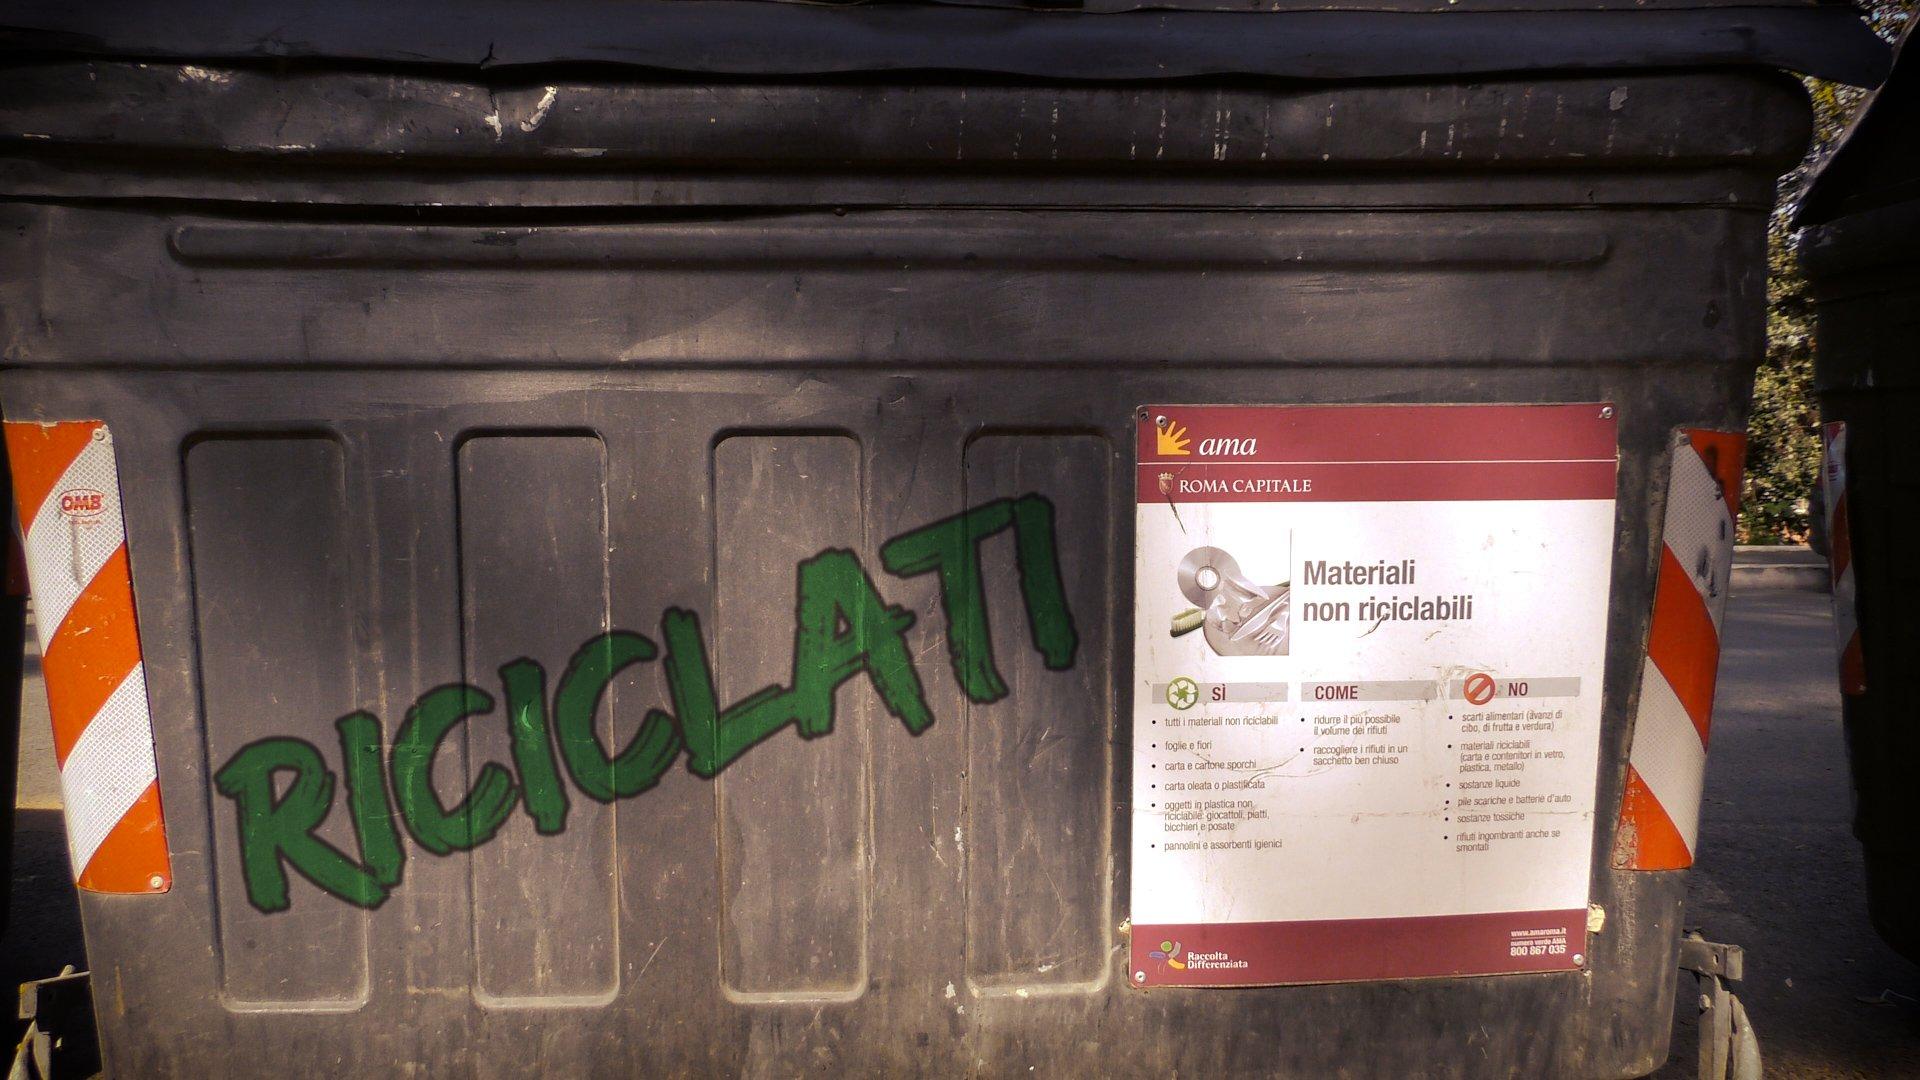 Roma Web Fest - Riciclati